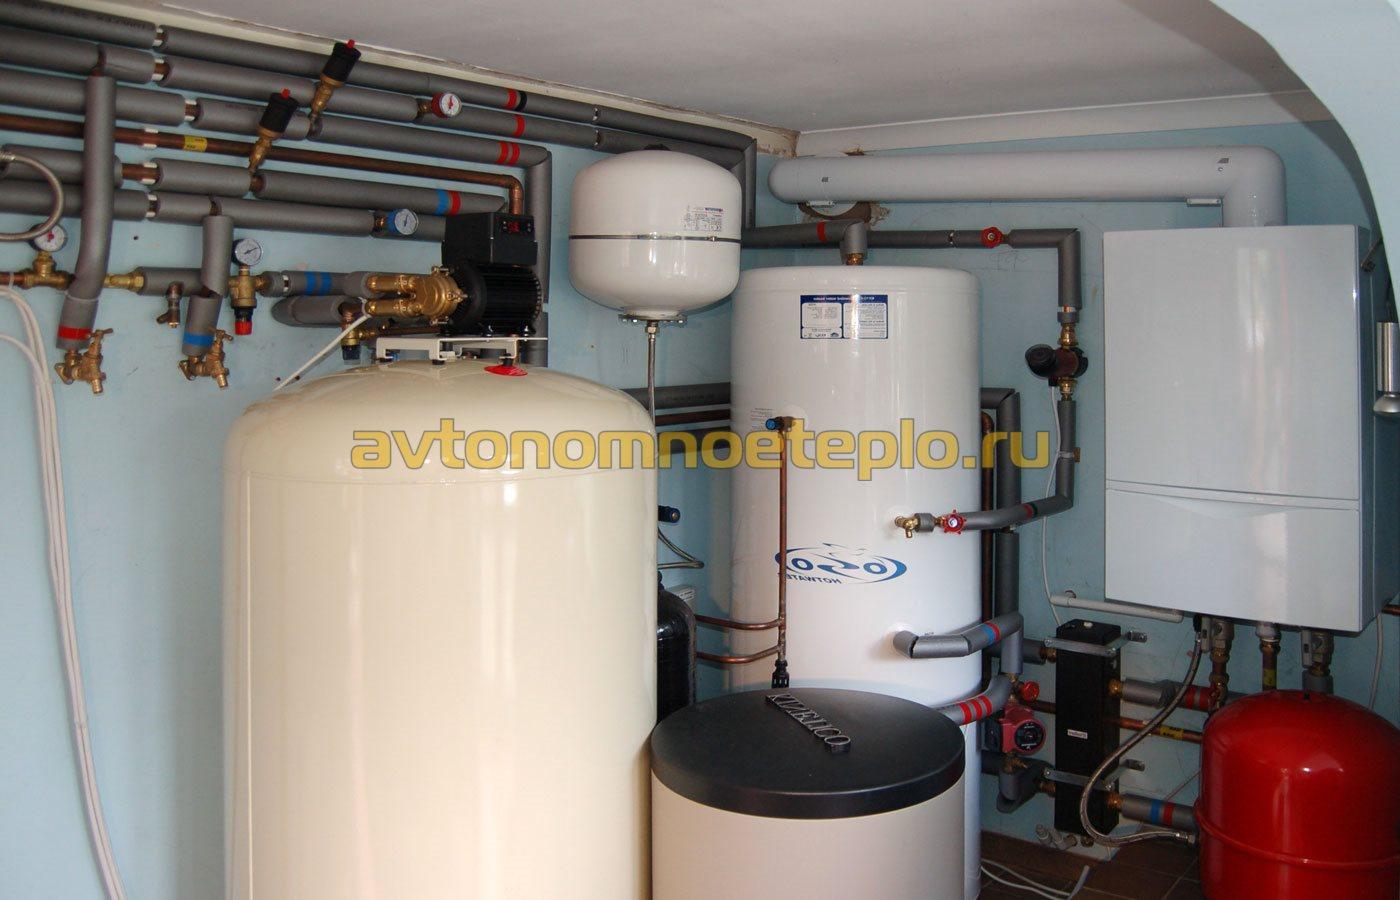 Chaudiere gaz basse temperature condensation etablir un devis antony entreprise zdhi - Chaudiere basse temperature ...